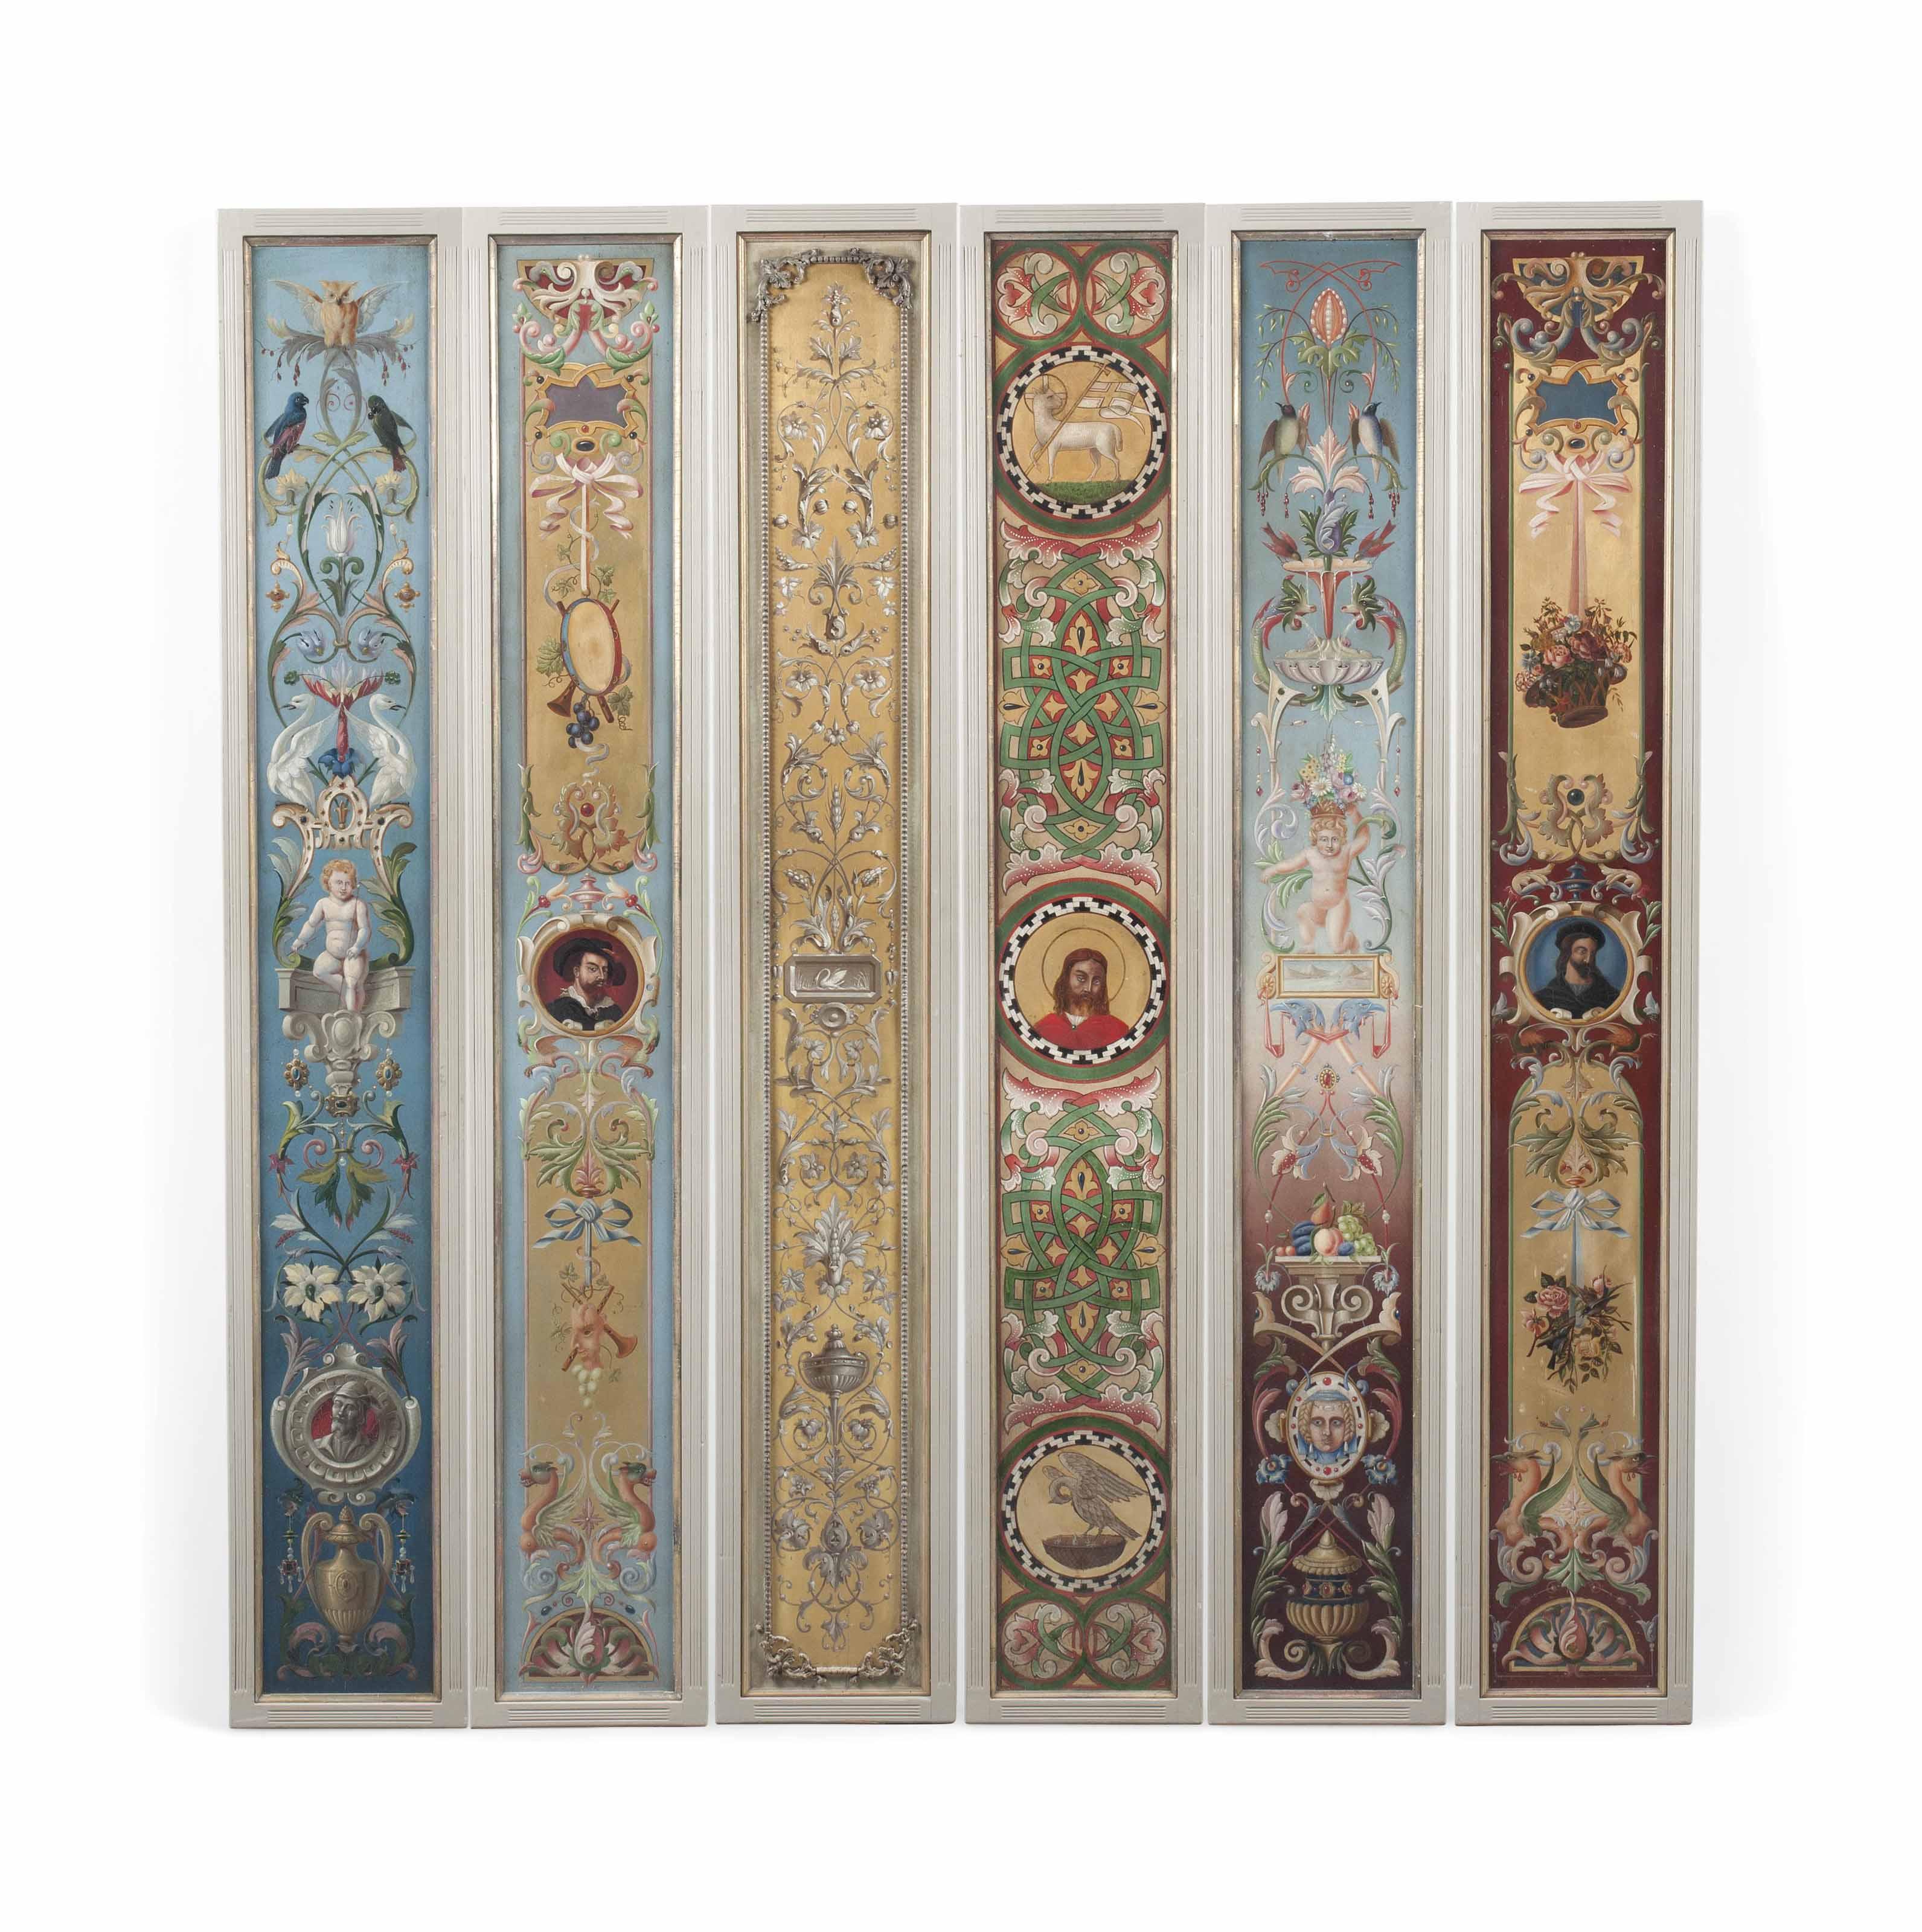 SIX ENGLISH POLYCHROME-DECORATED WALL PANELS